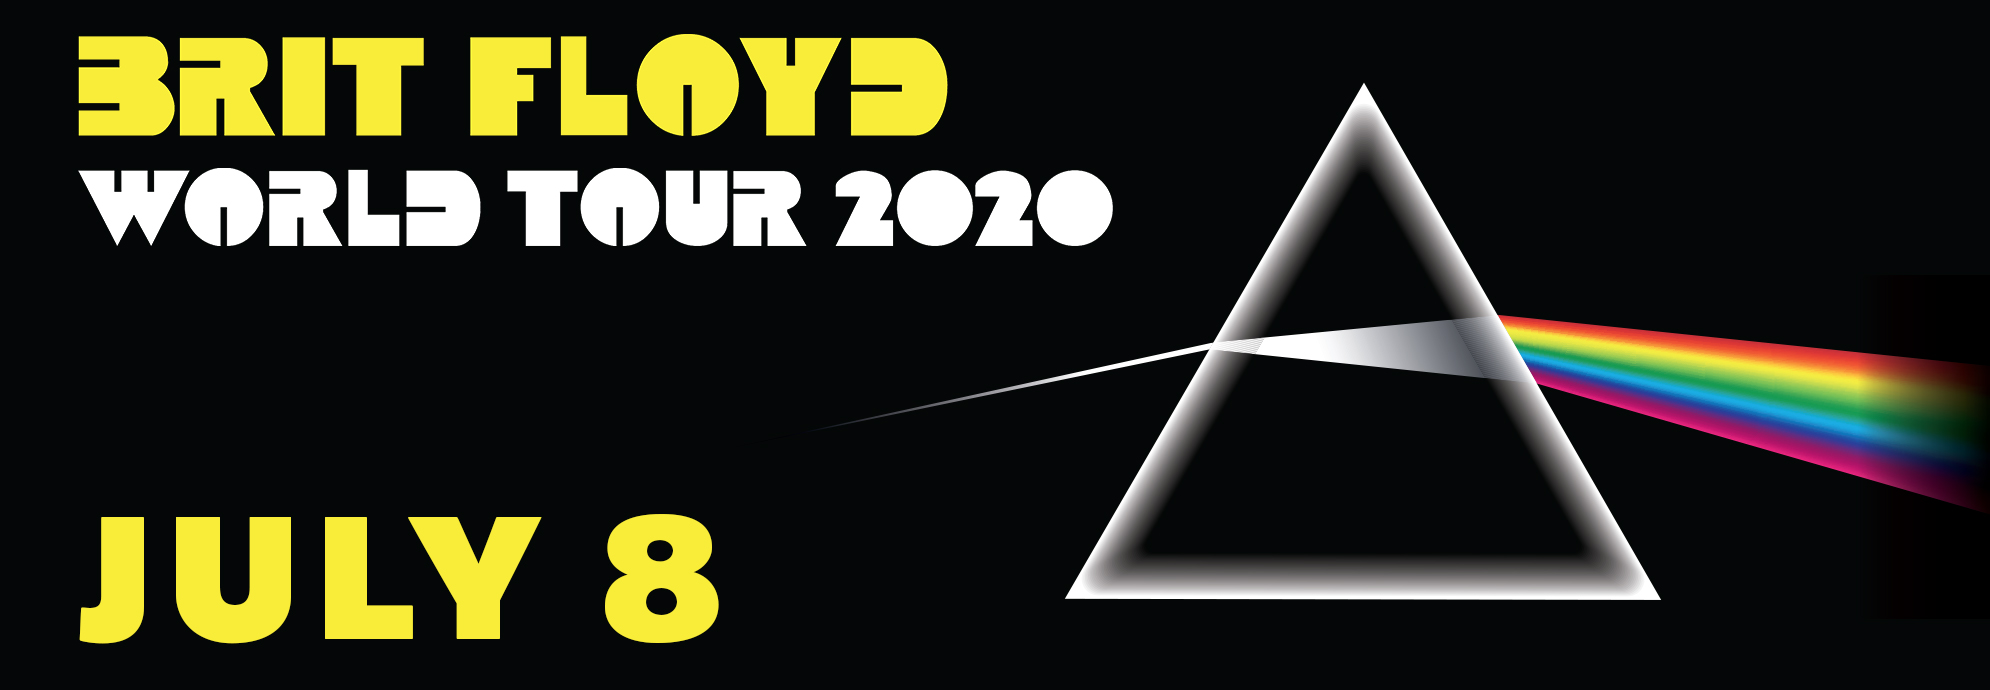 Brit Floyd World Tour 2020